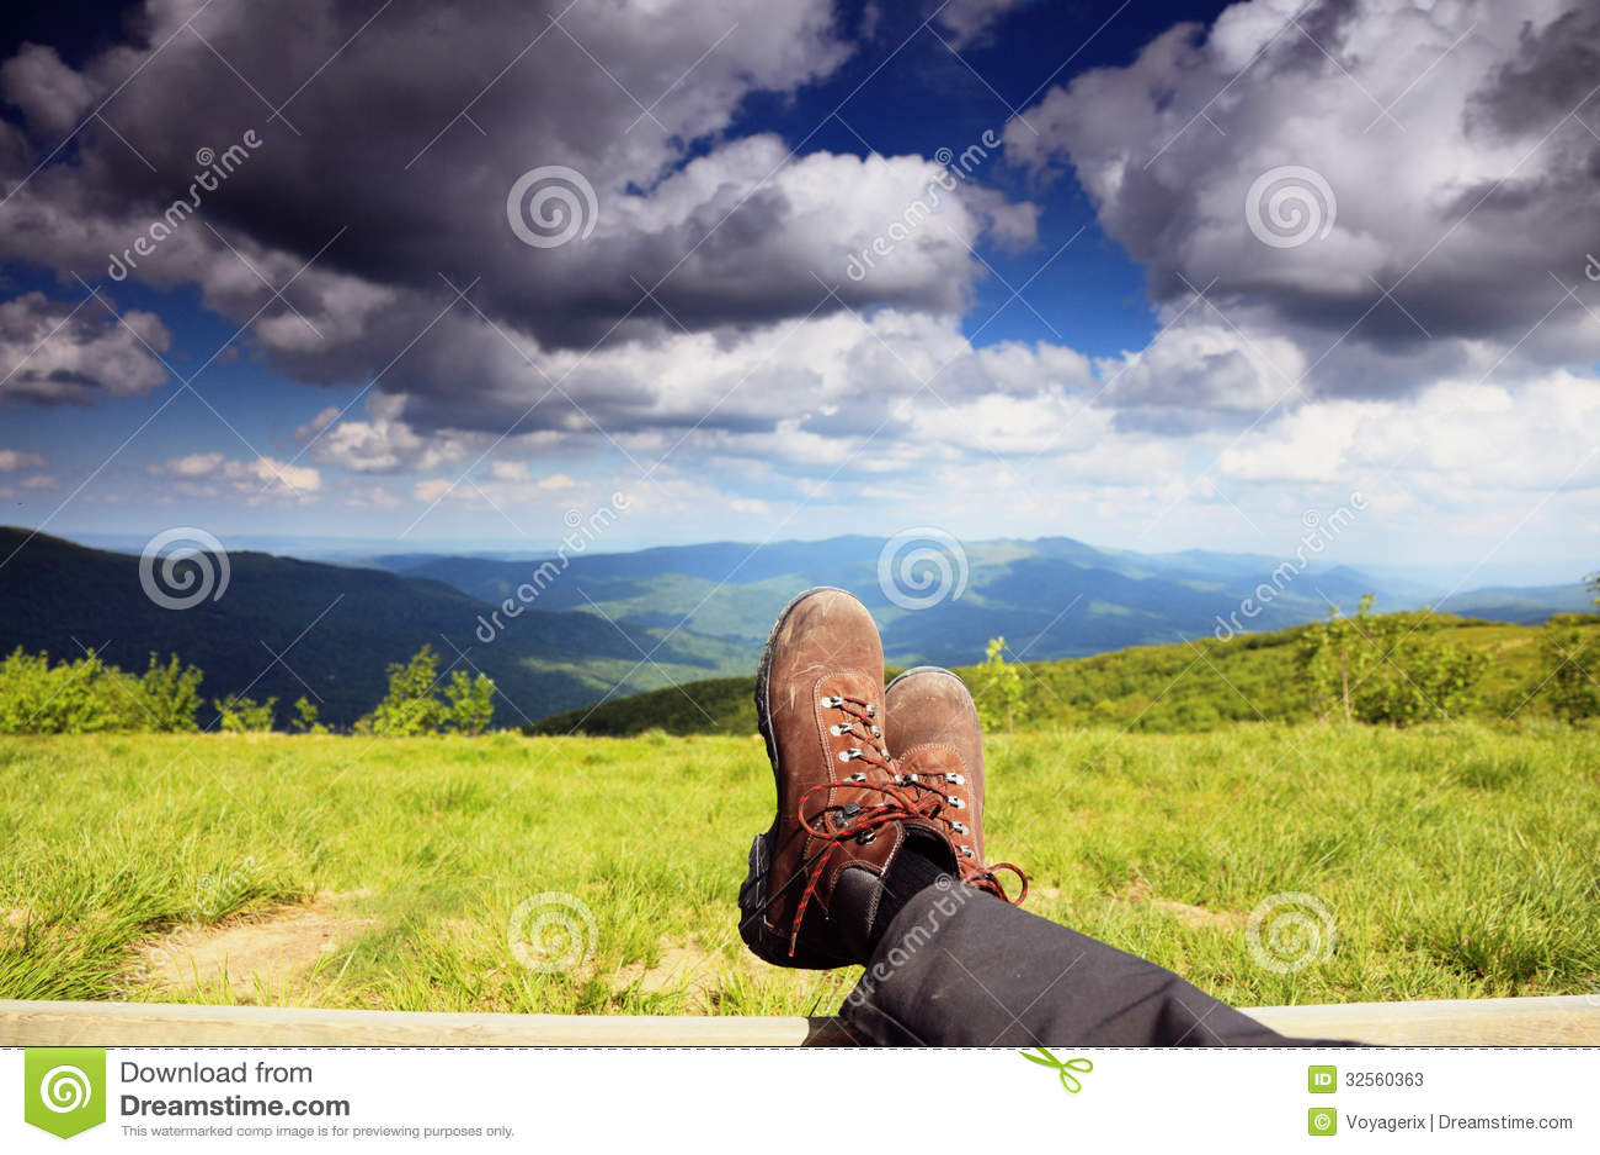 boots male massage  mountains